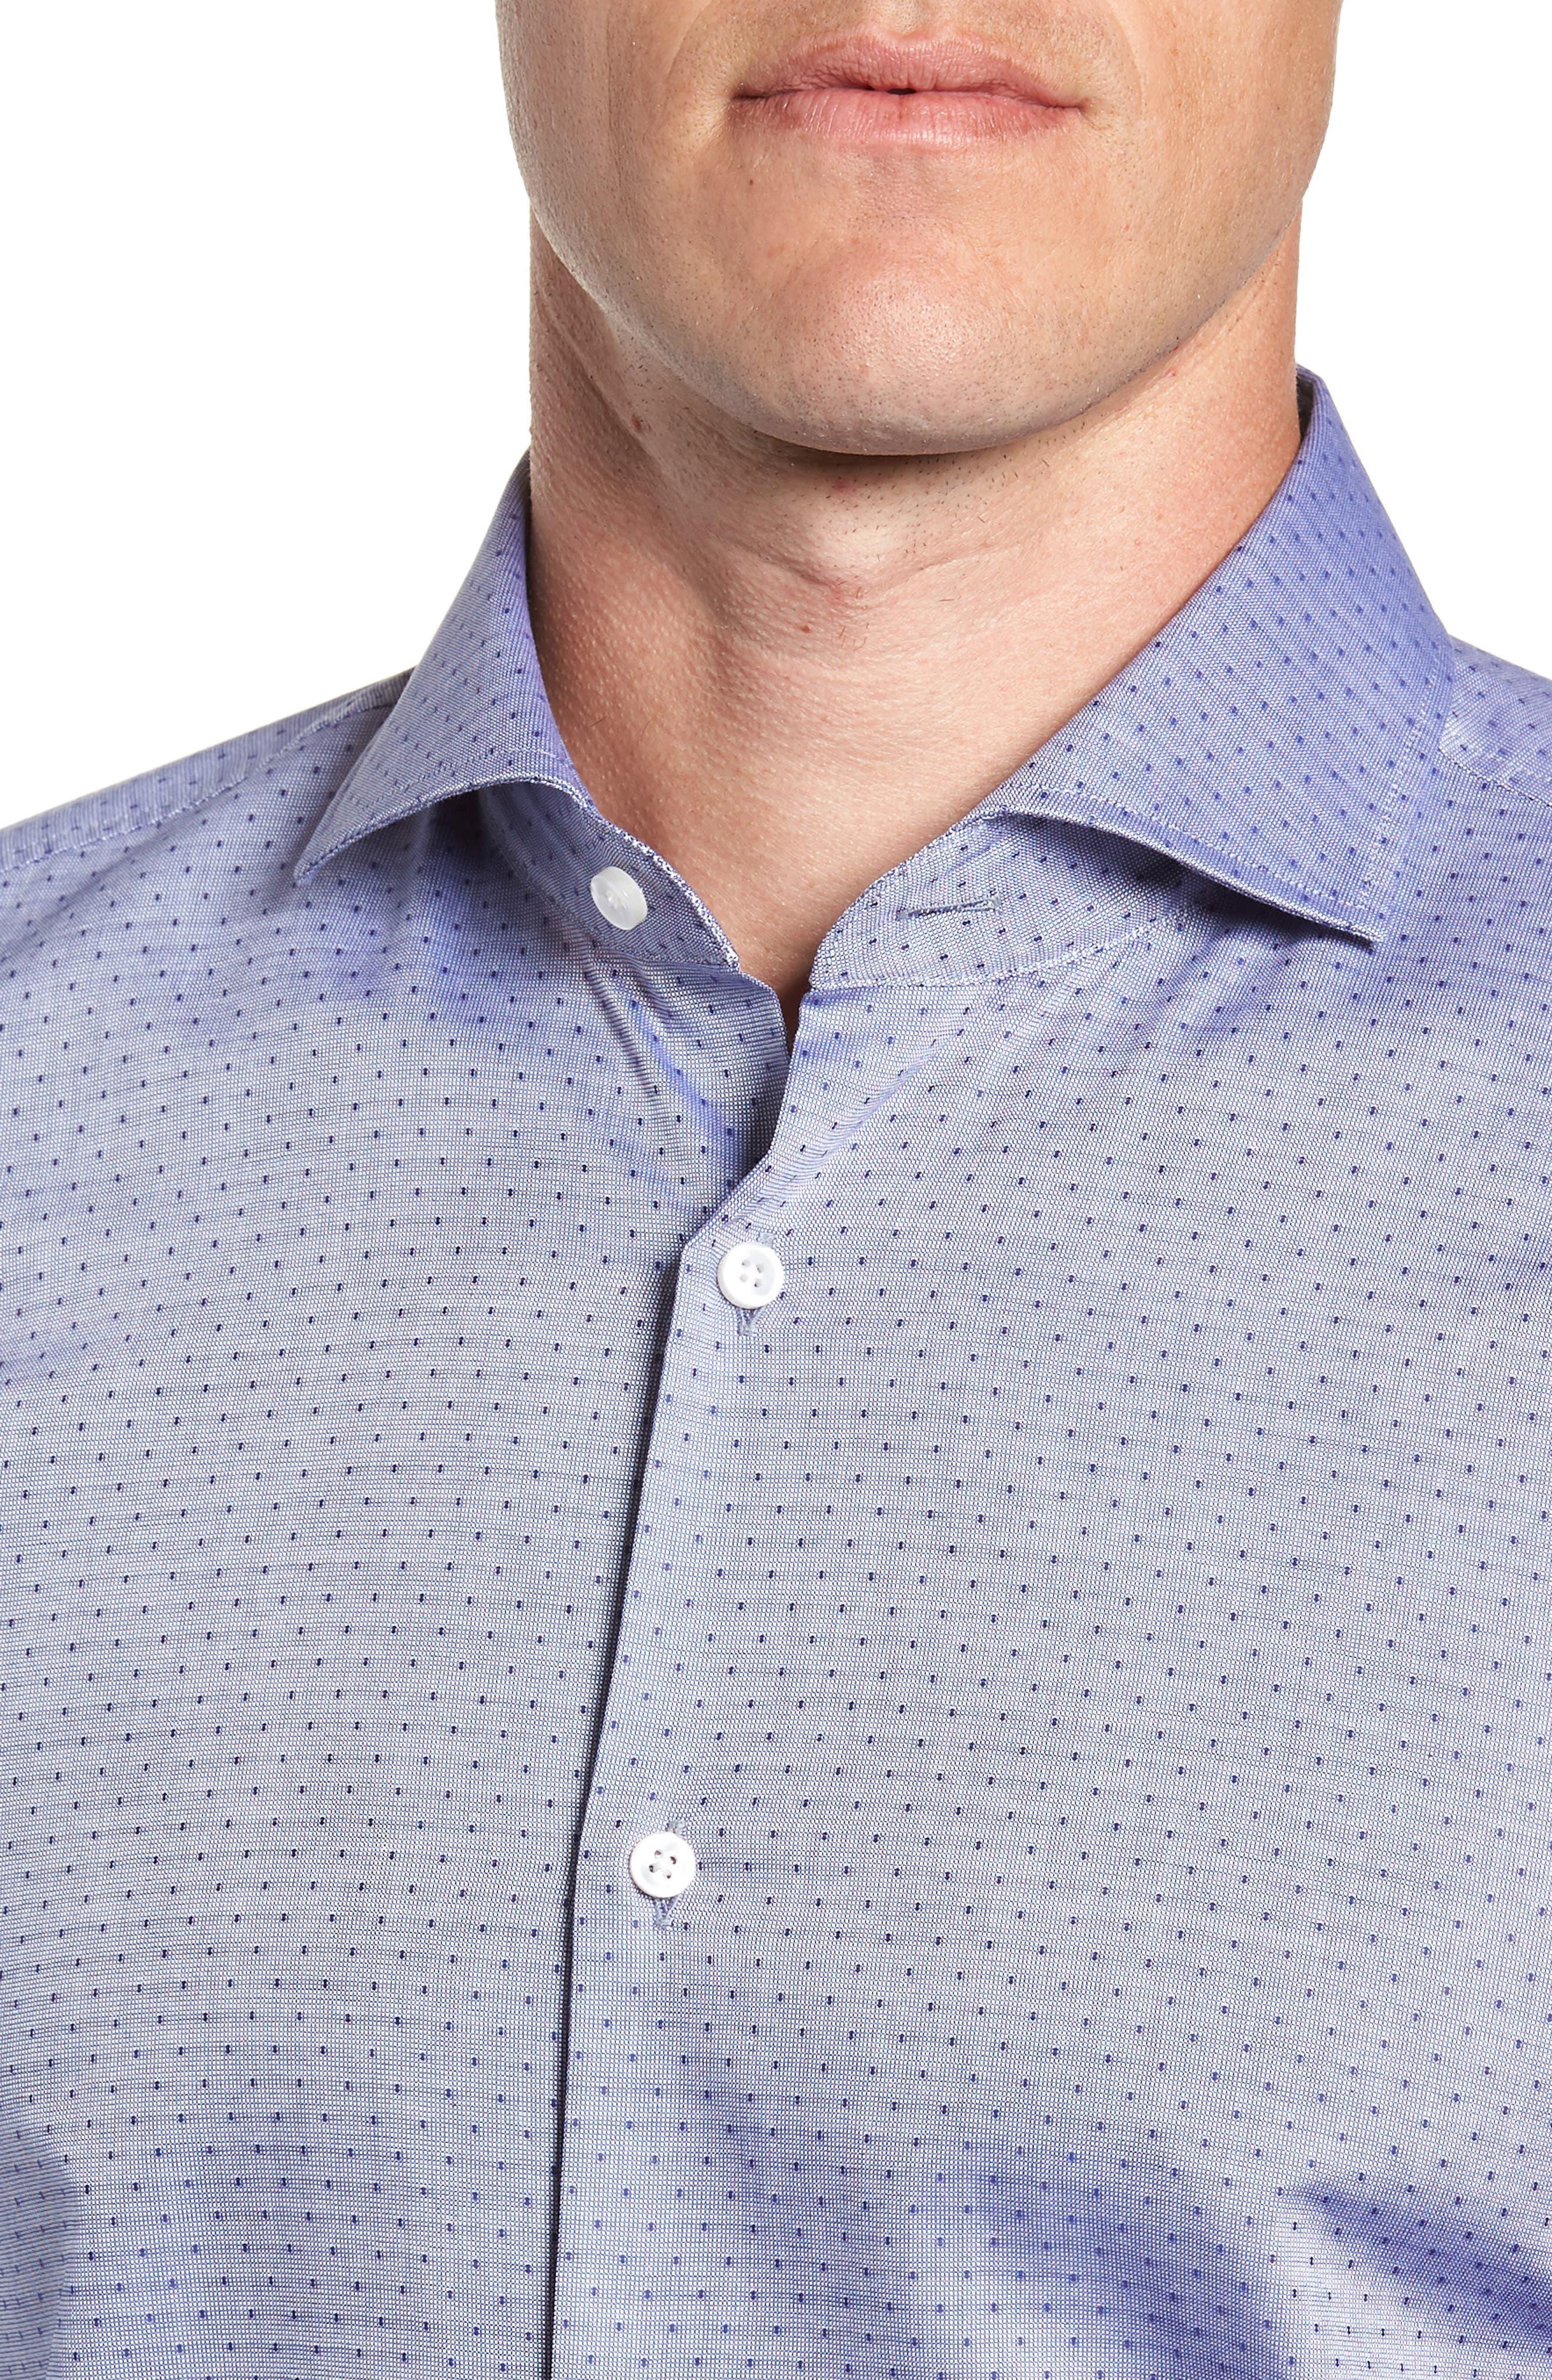 Jason Slim Fit Dot Dress Shirt,                             Alternate thumbnail 2, color,                             NAVY